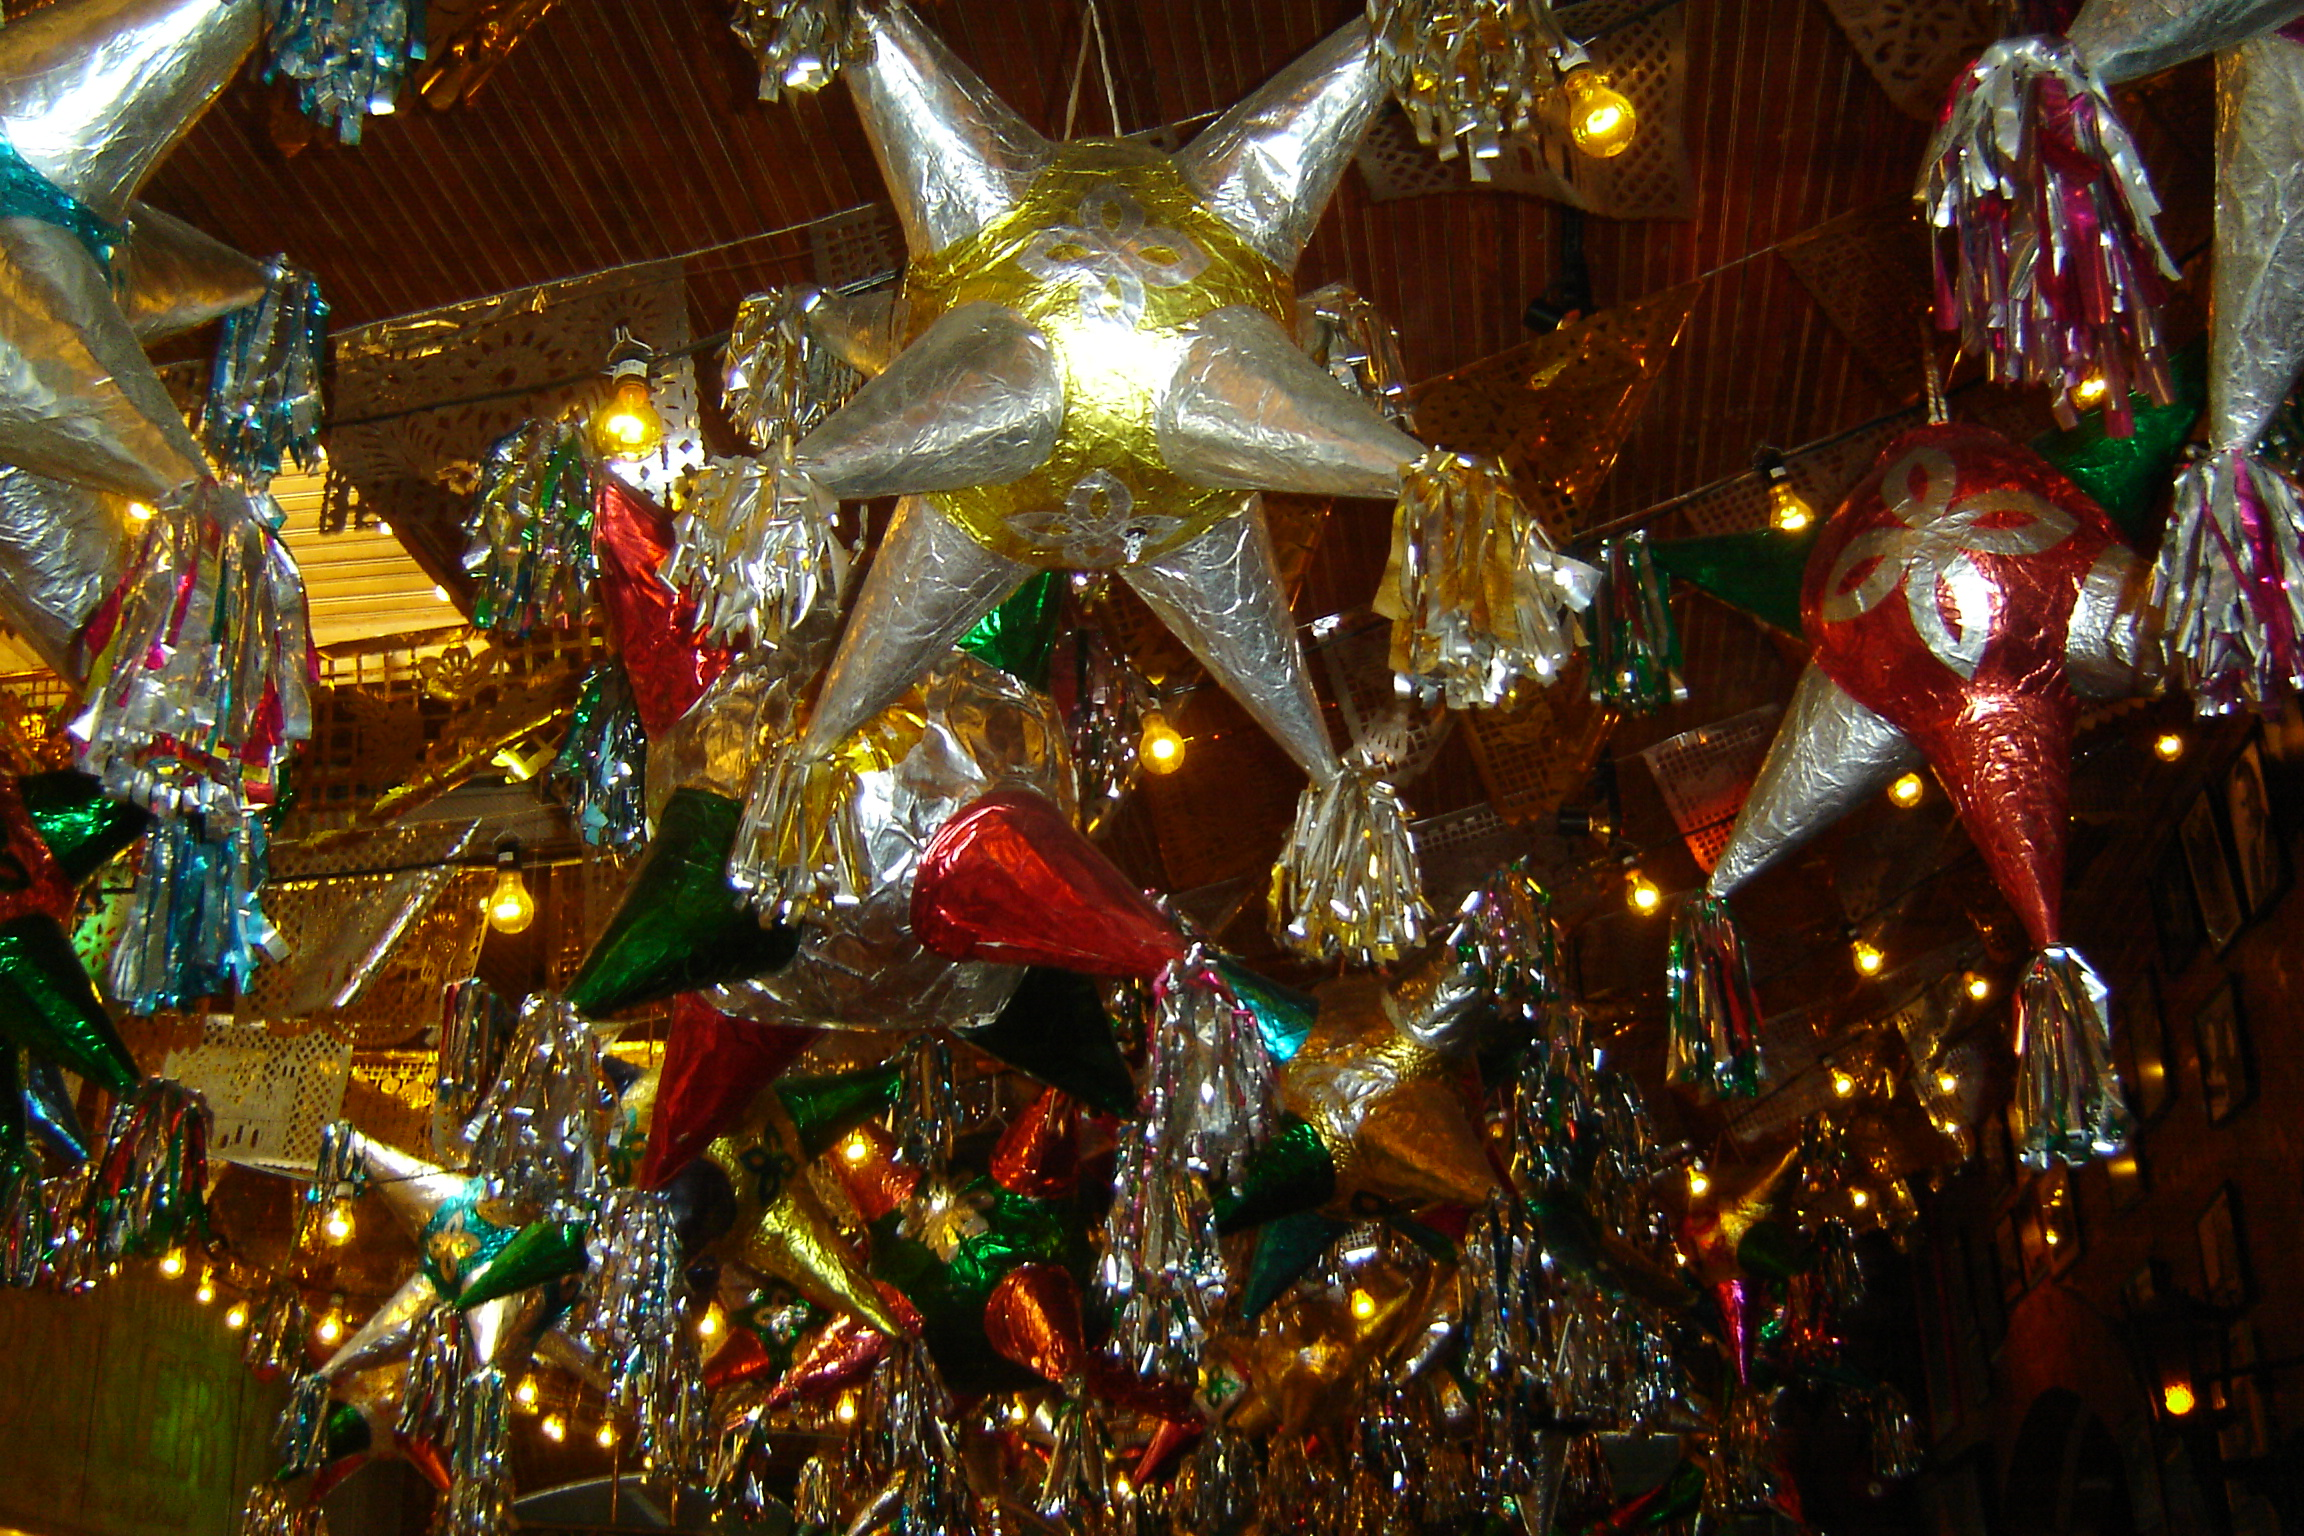 Stars on the ceiling of Mi Tierra Cafe in San Antonio